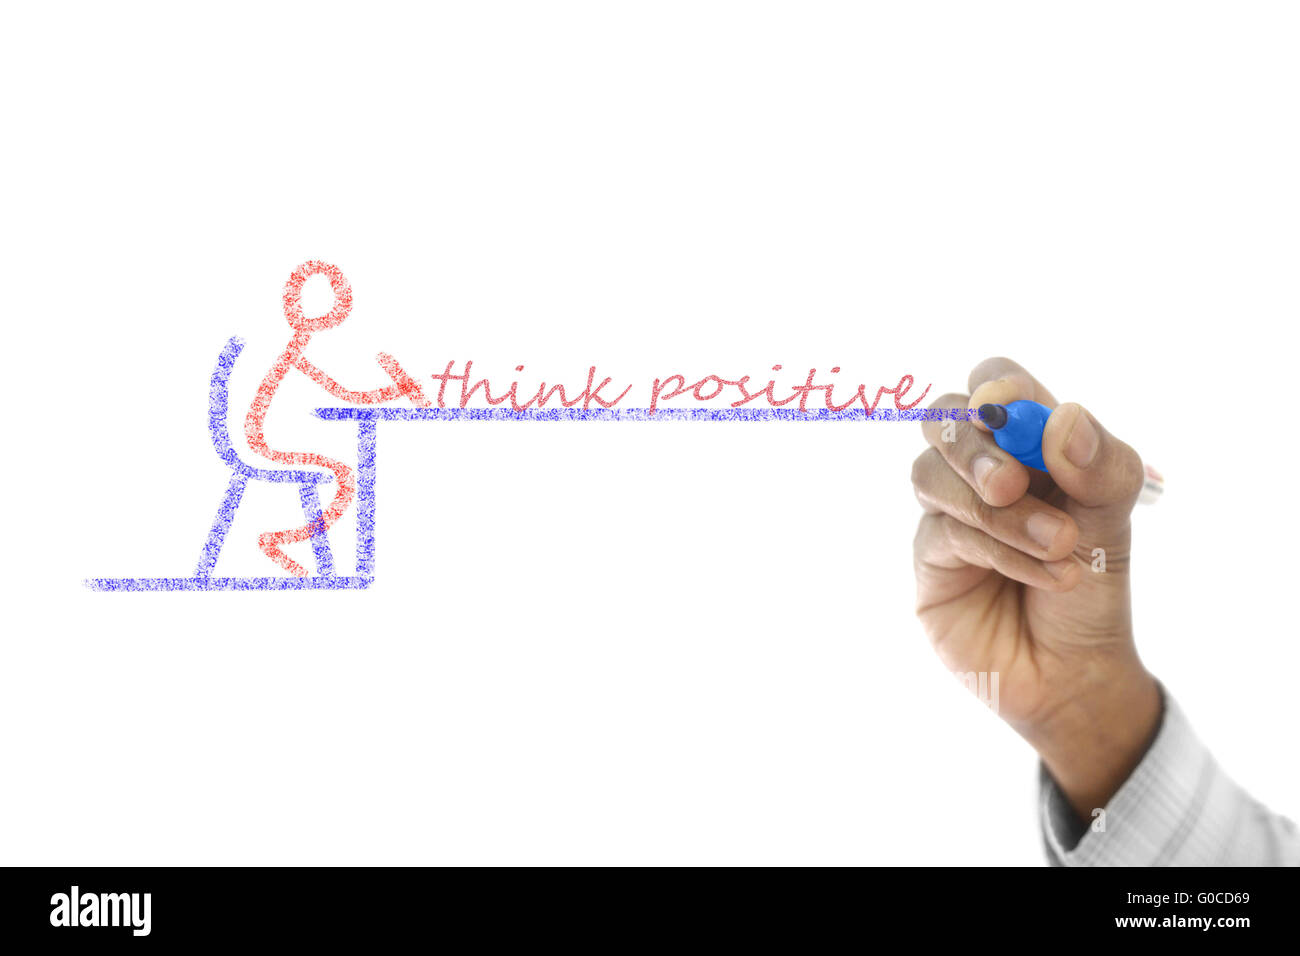 Pensar positivo escrito en junta de barrido transparente Imagen De Stock